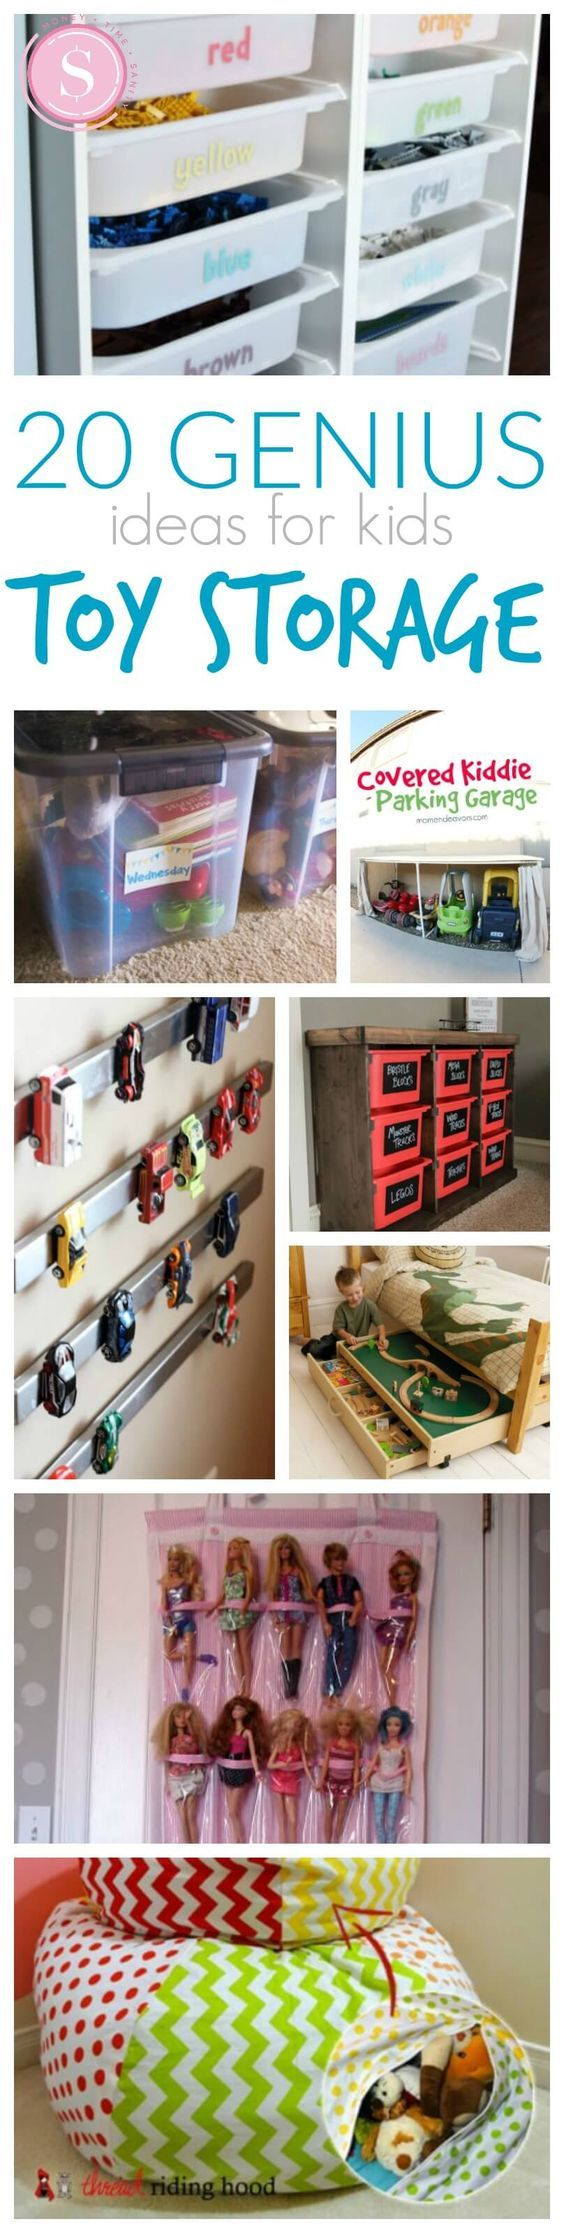 best organizesimplify images on pinterest organization ideas